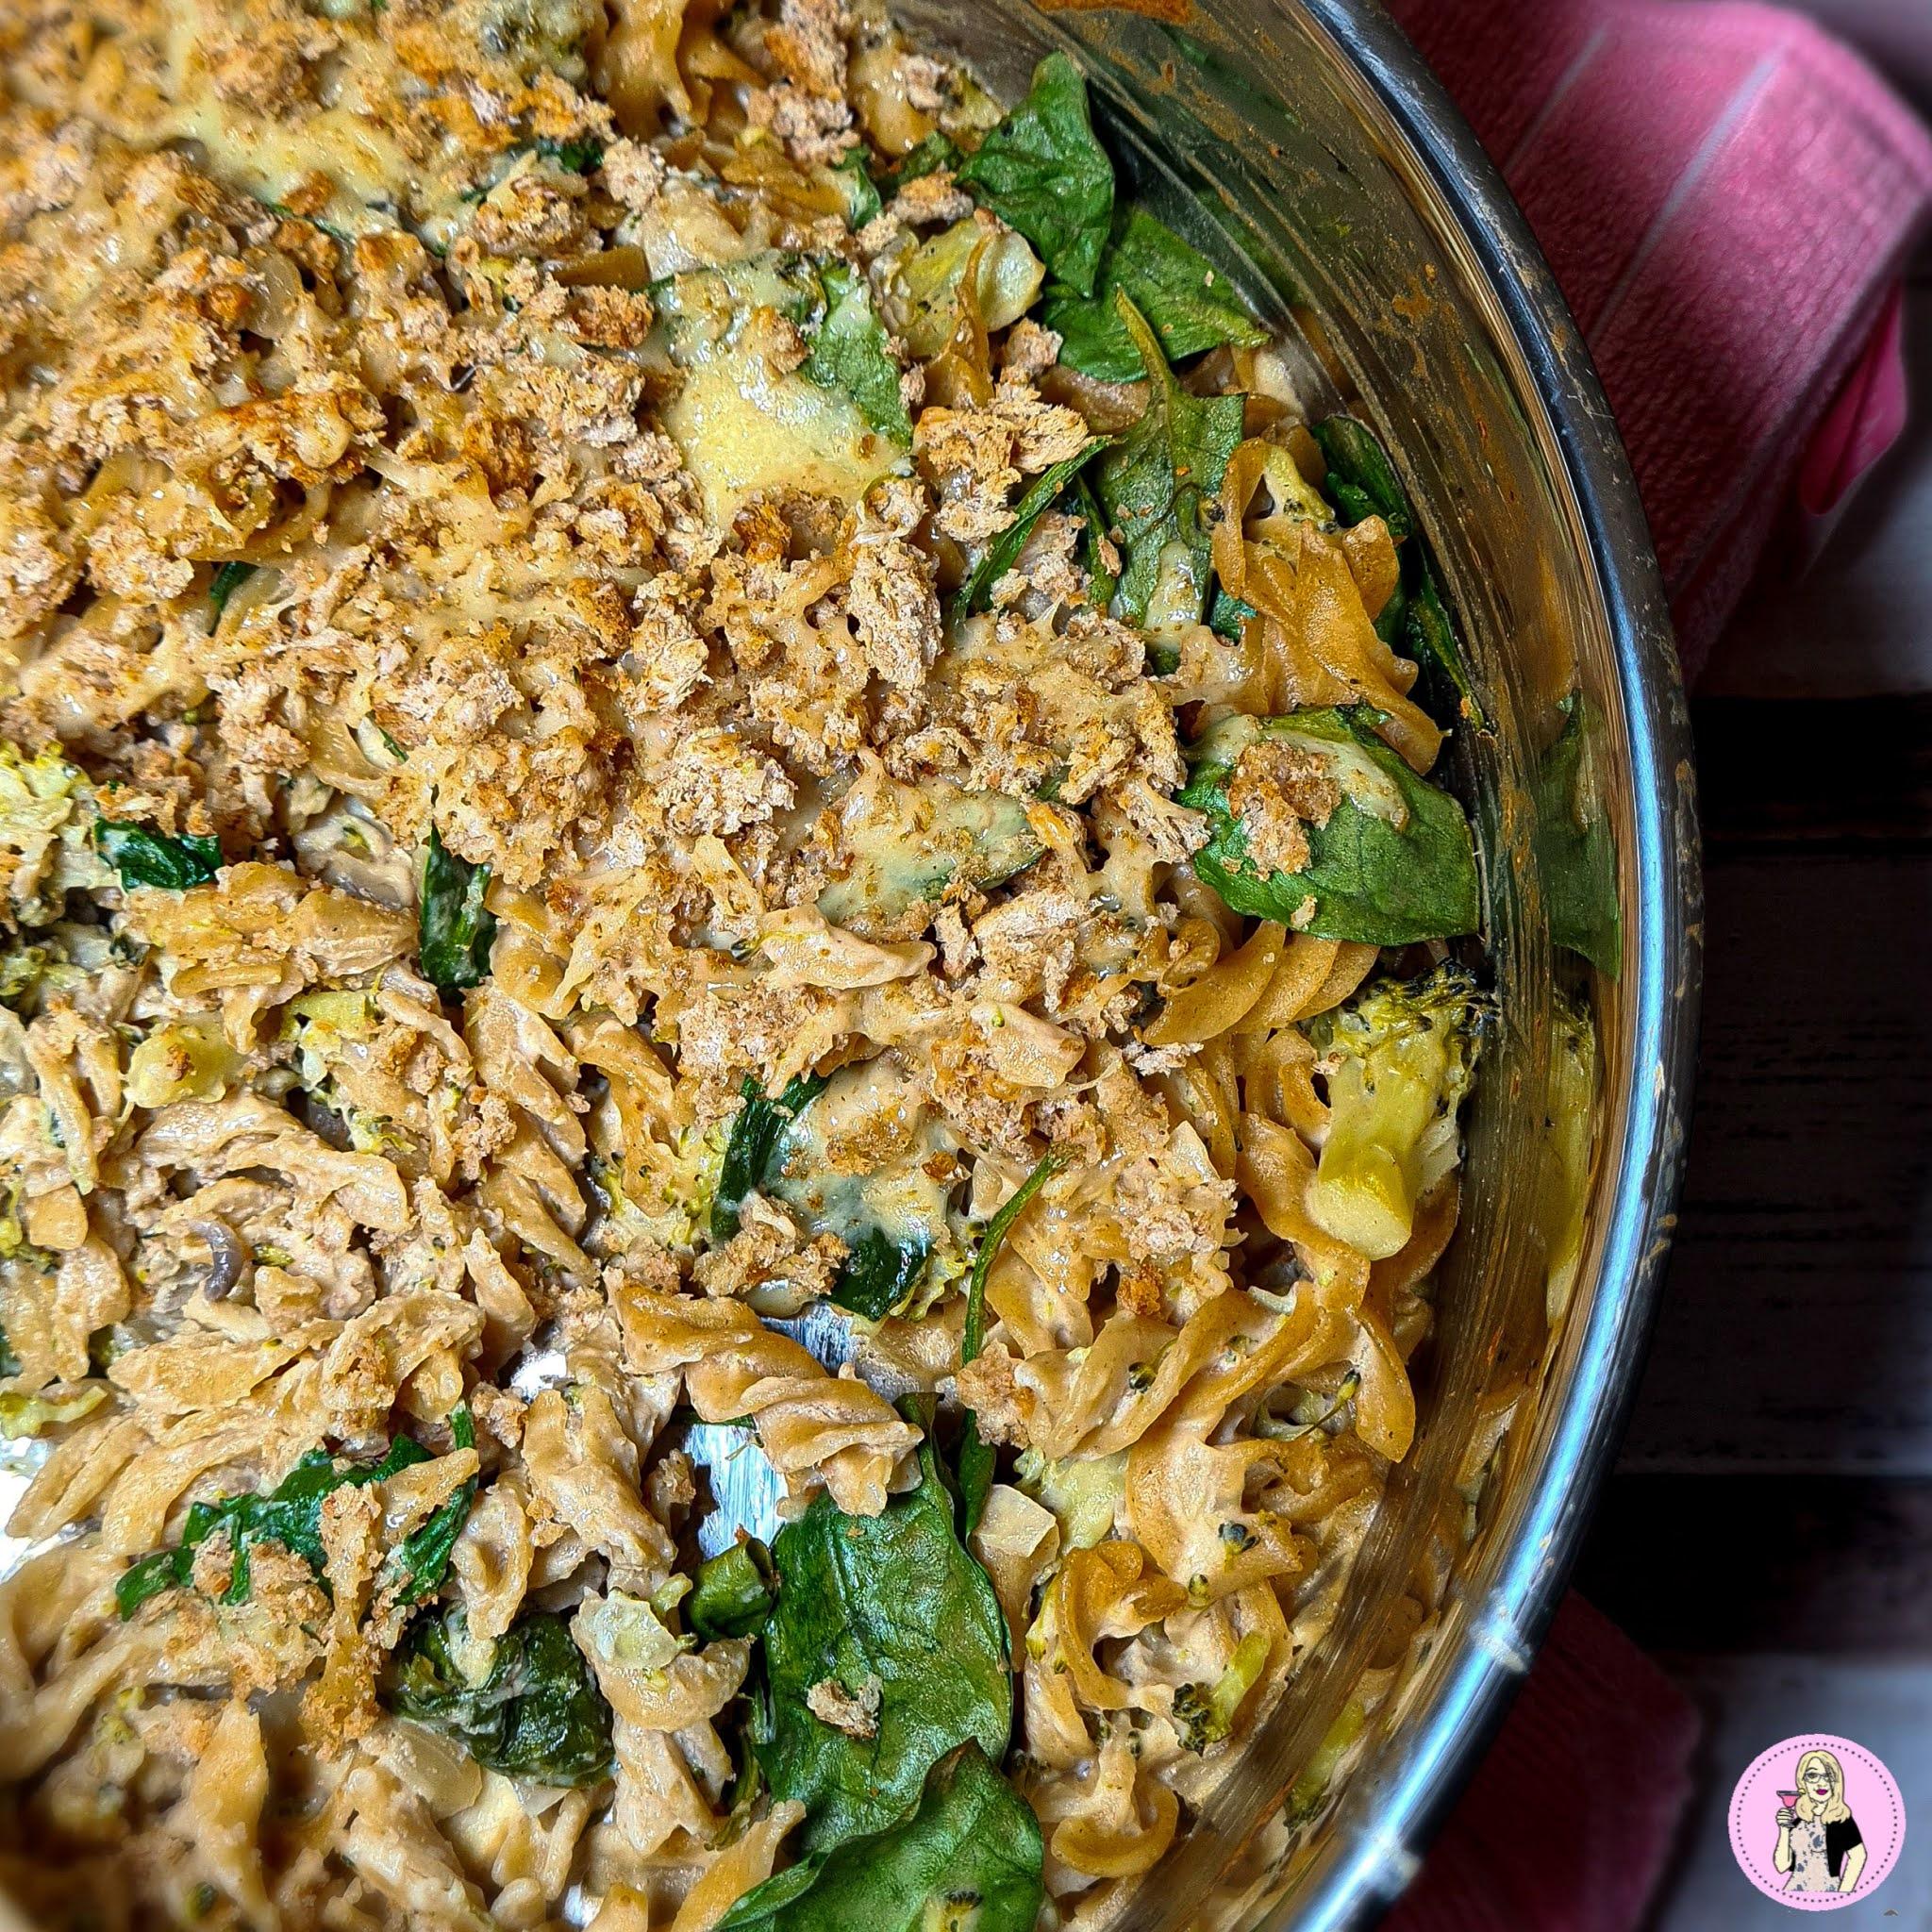 Creamy Spinach & Broccoli Pasta with Garlic & Herb Crumb | Slimming Recipe